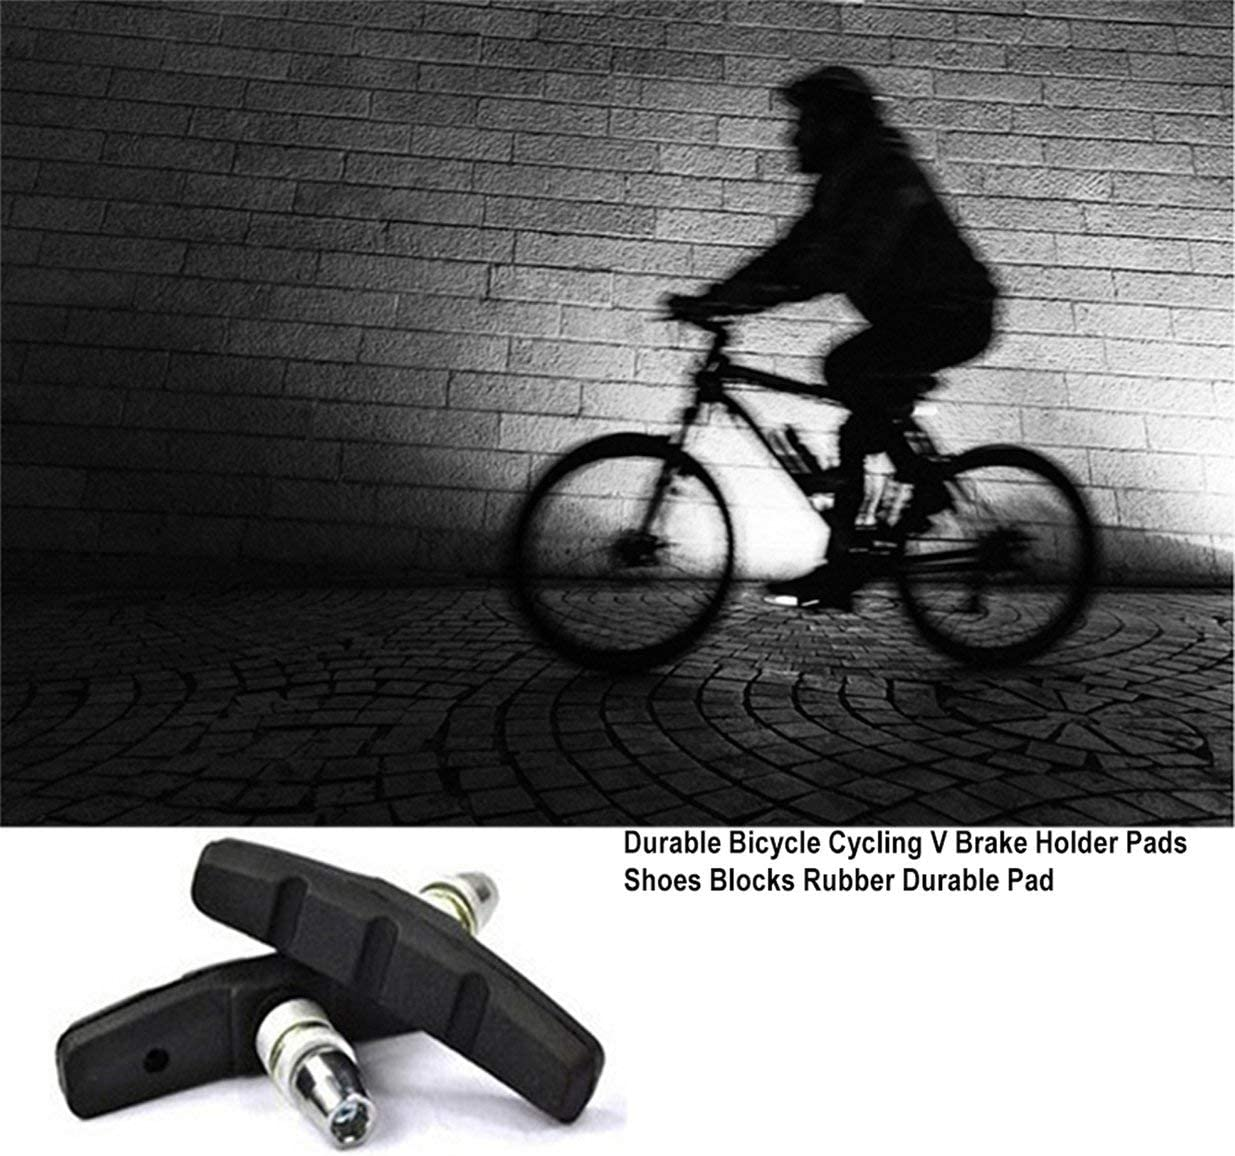 Schwarz IFEN Durable Bicycle Cycling Bike V Bremsbel/äge Schuhbl/öcke Black Rubber Durable Pad F/ür lang anhaltende Leistung